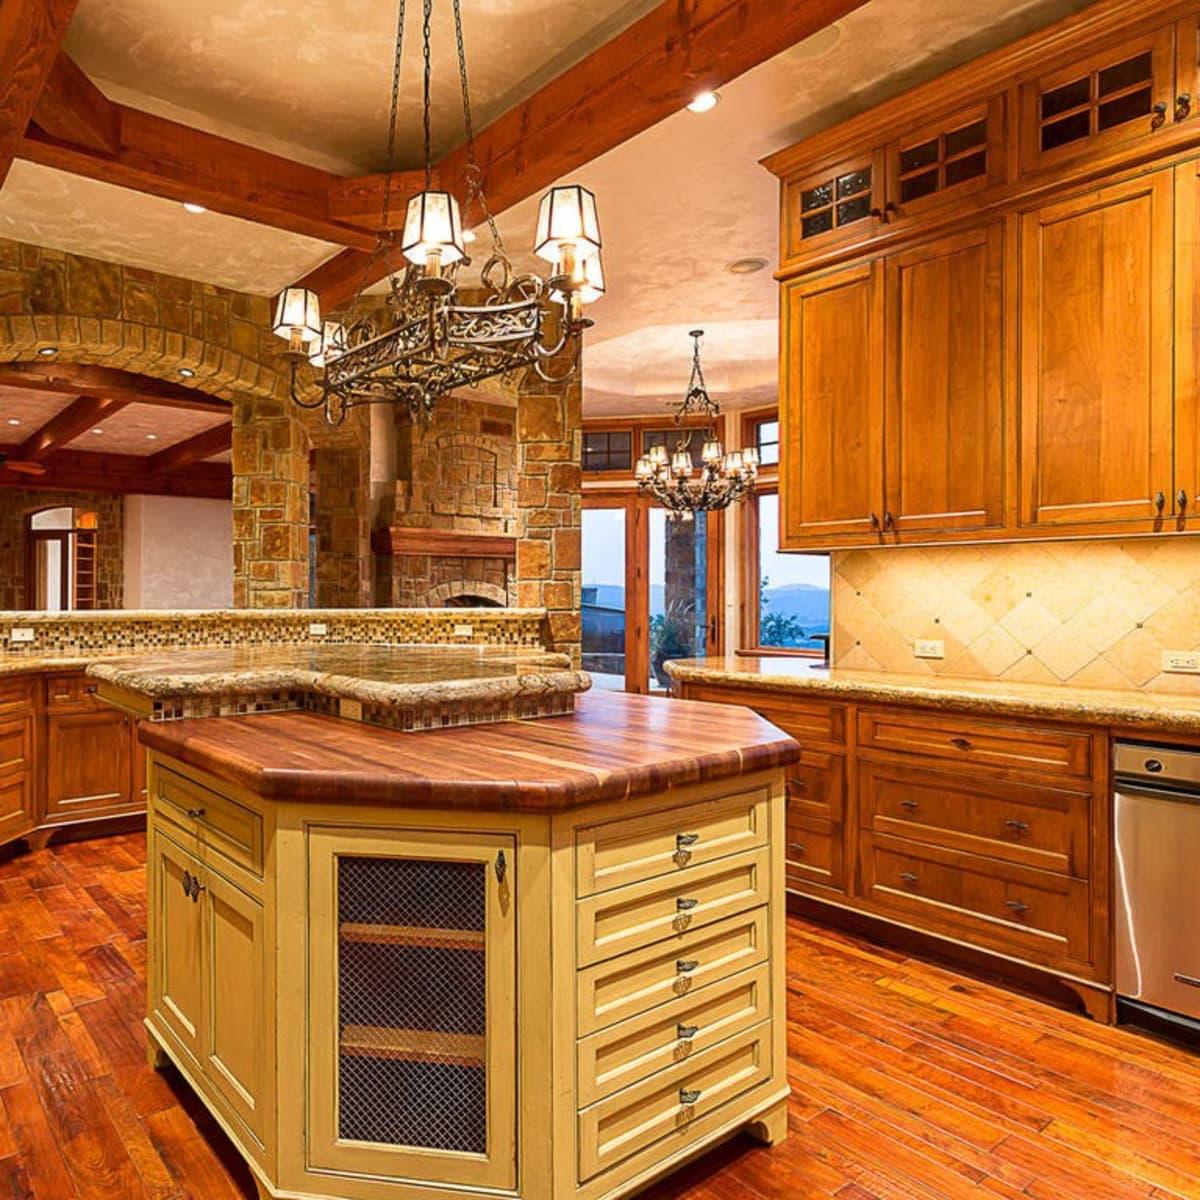 Austin home house 12006 Pleasant Panorama View 78738 Jeff Kent April 2016 kitchen